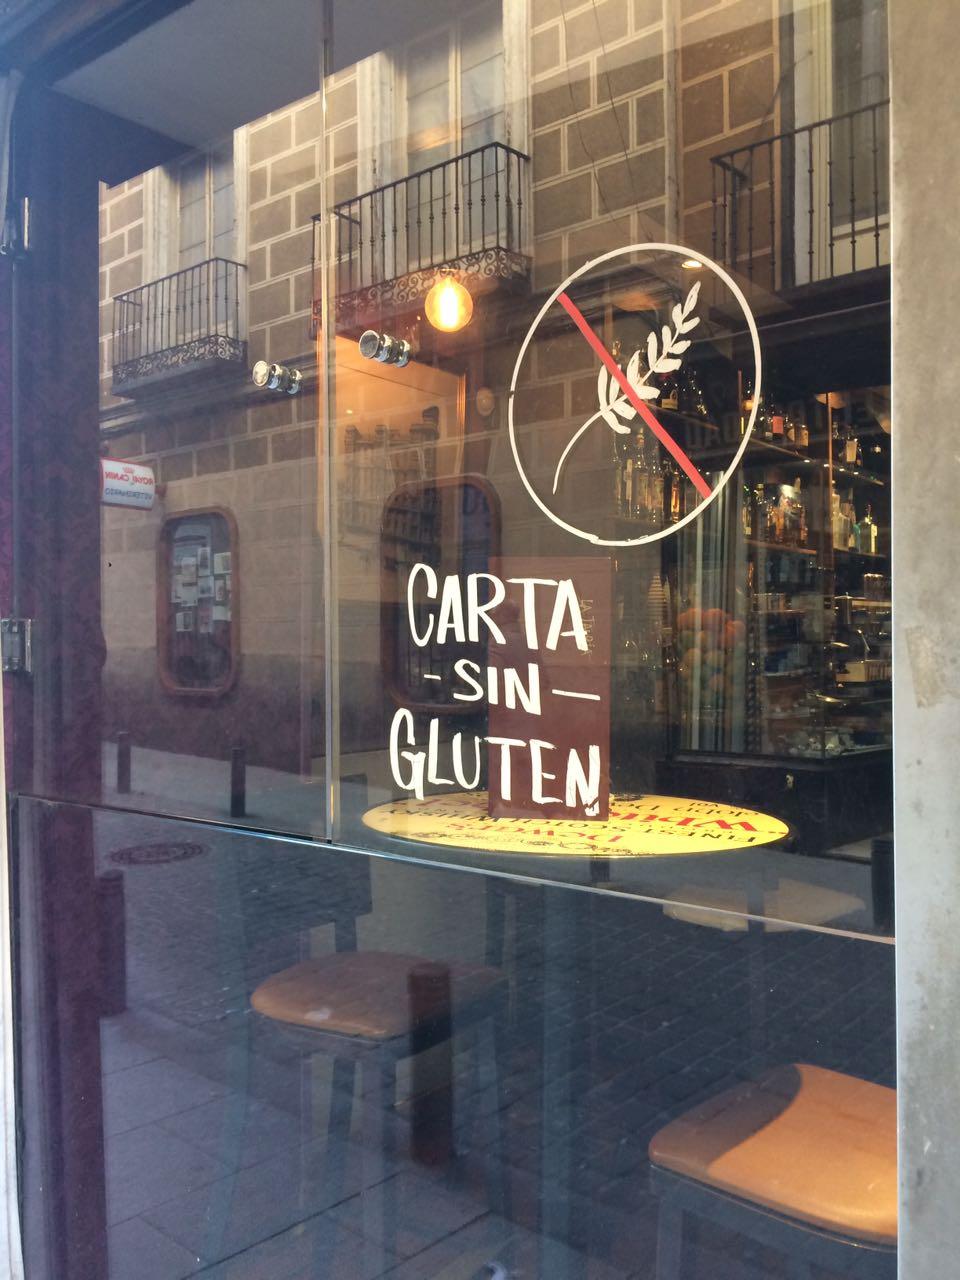 Gluten free bar